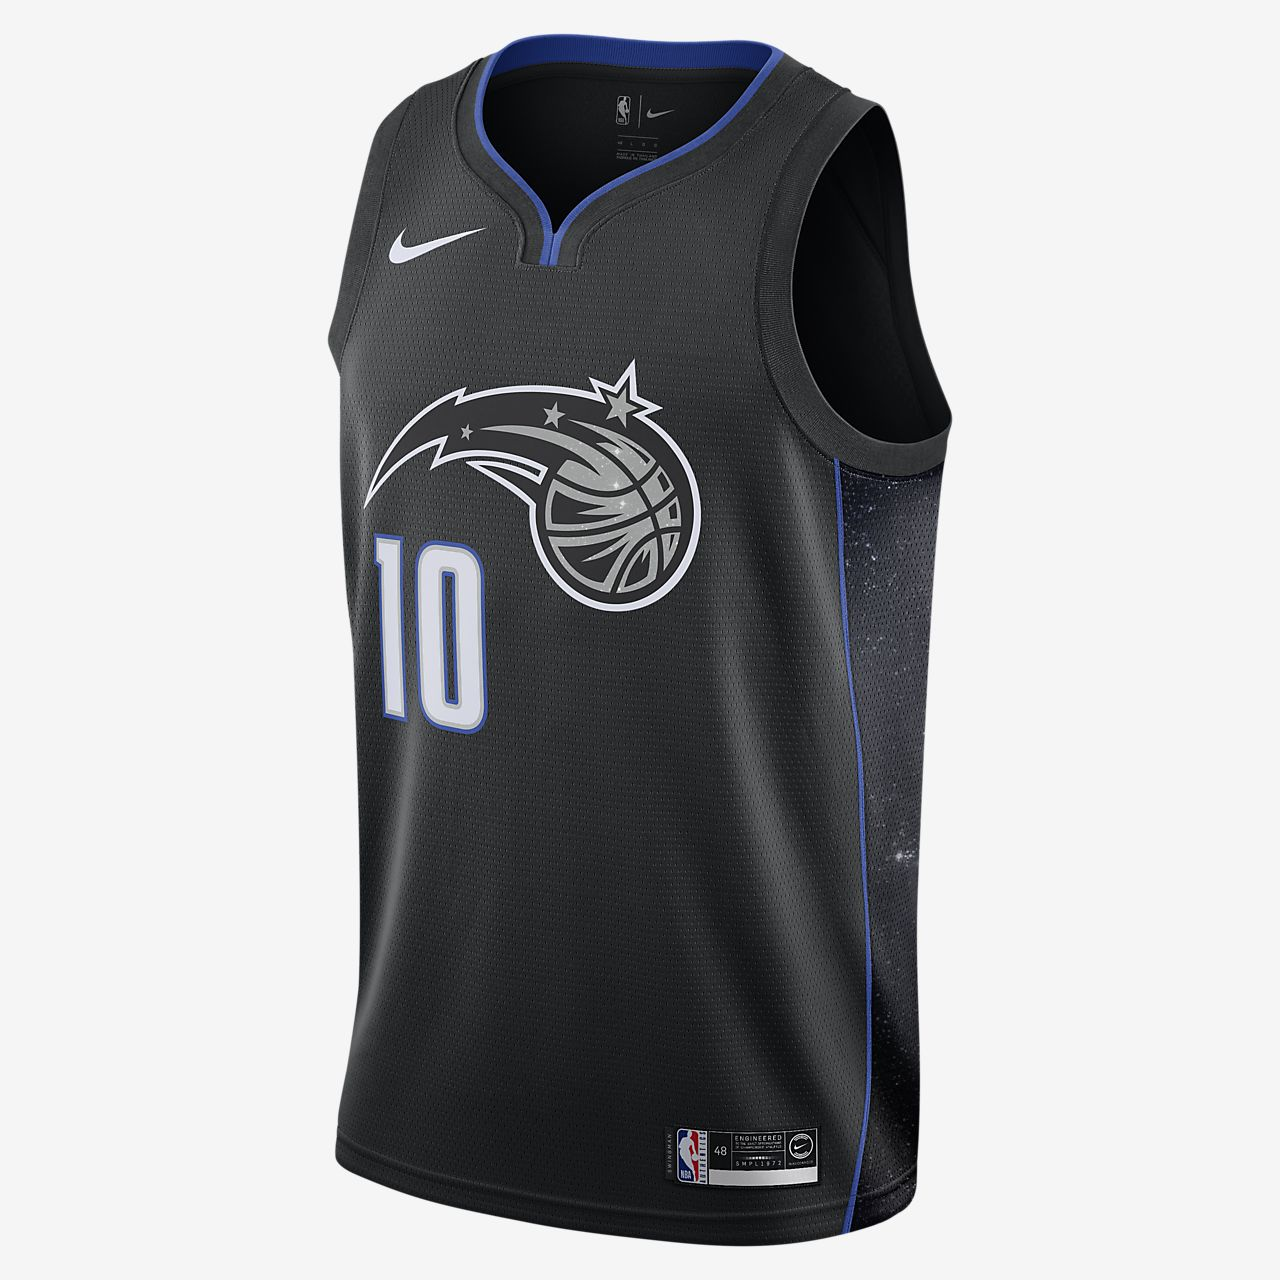 Maillot connecté Nike NBA Evan Fournier City Edition Swingman (Orlando Magic) pour Homme